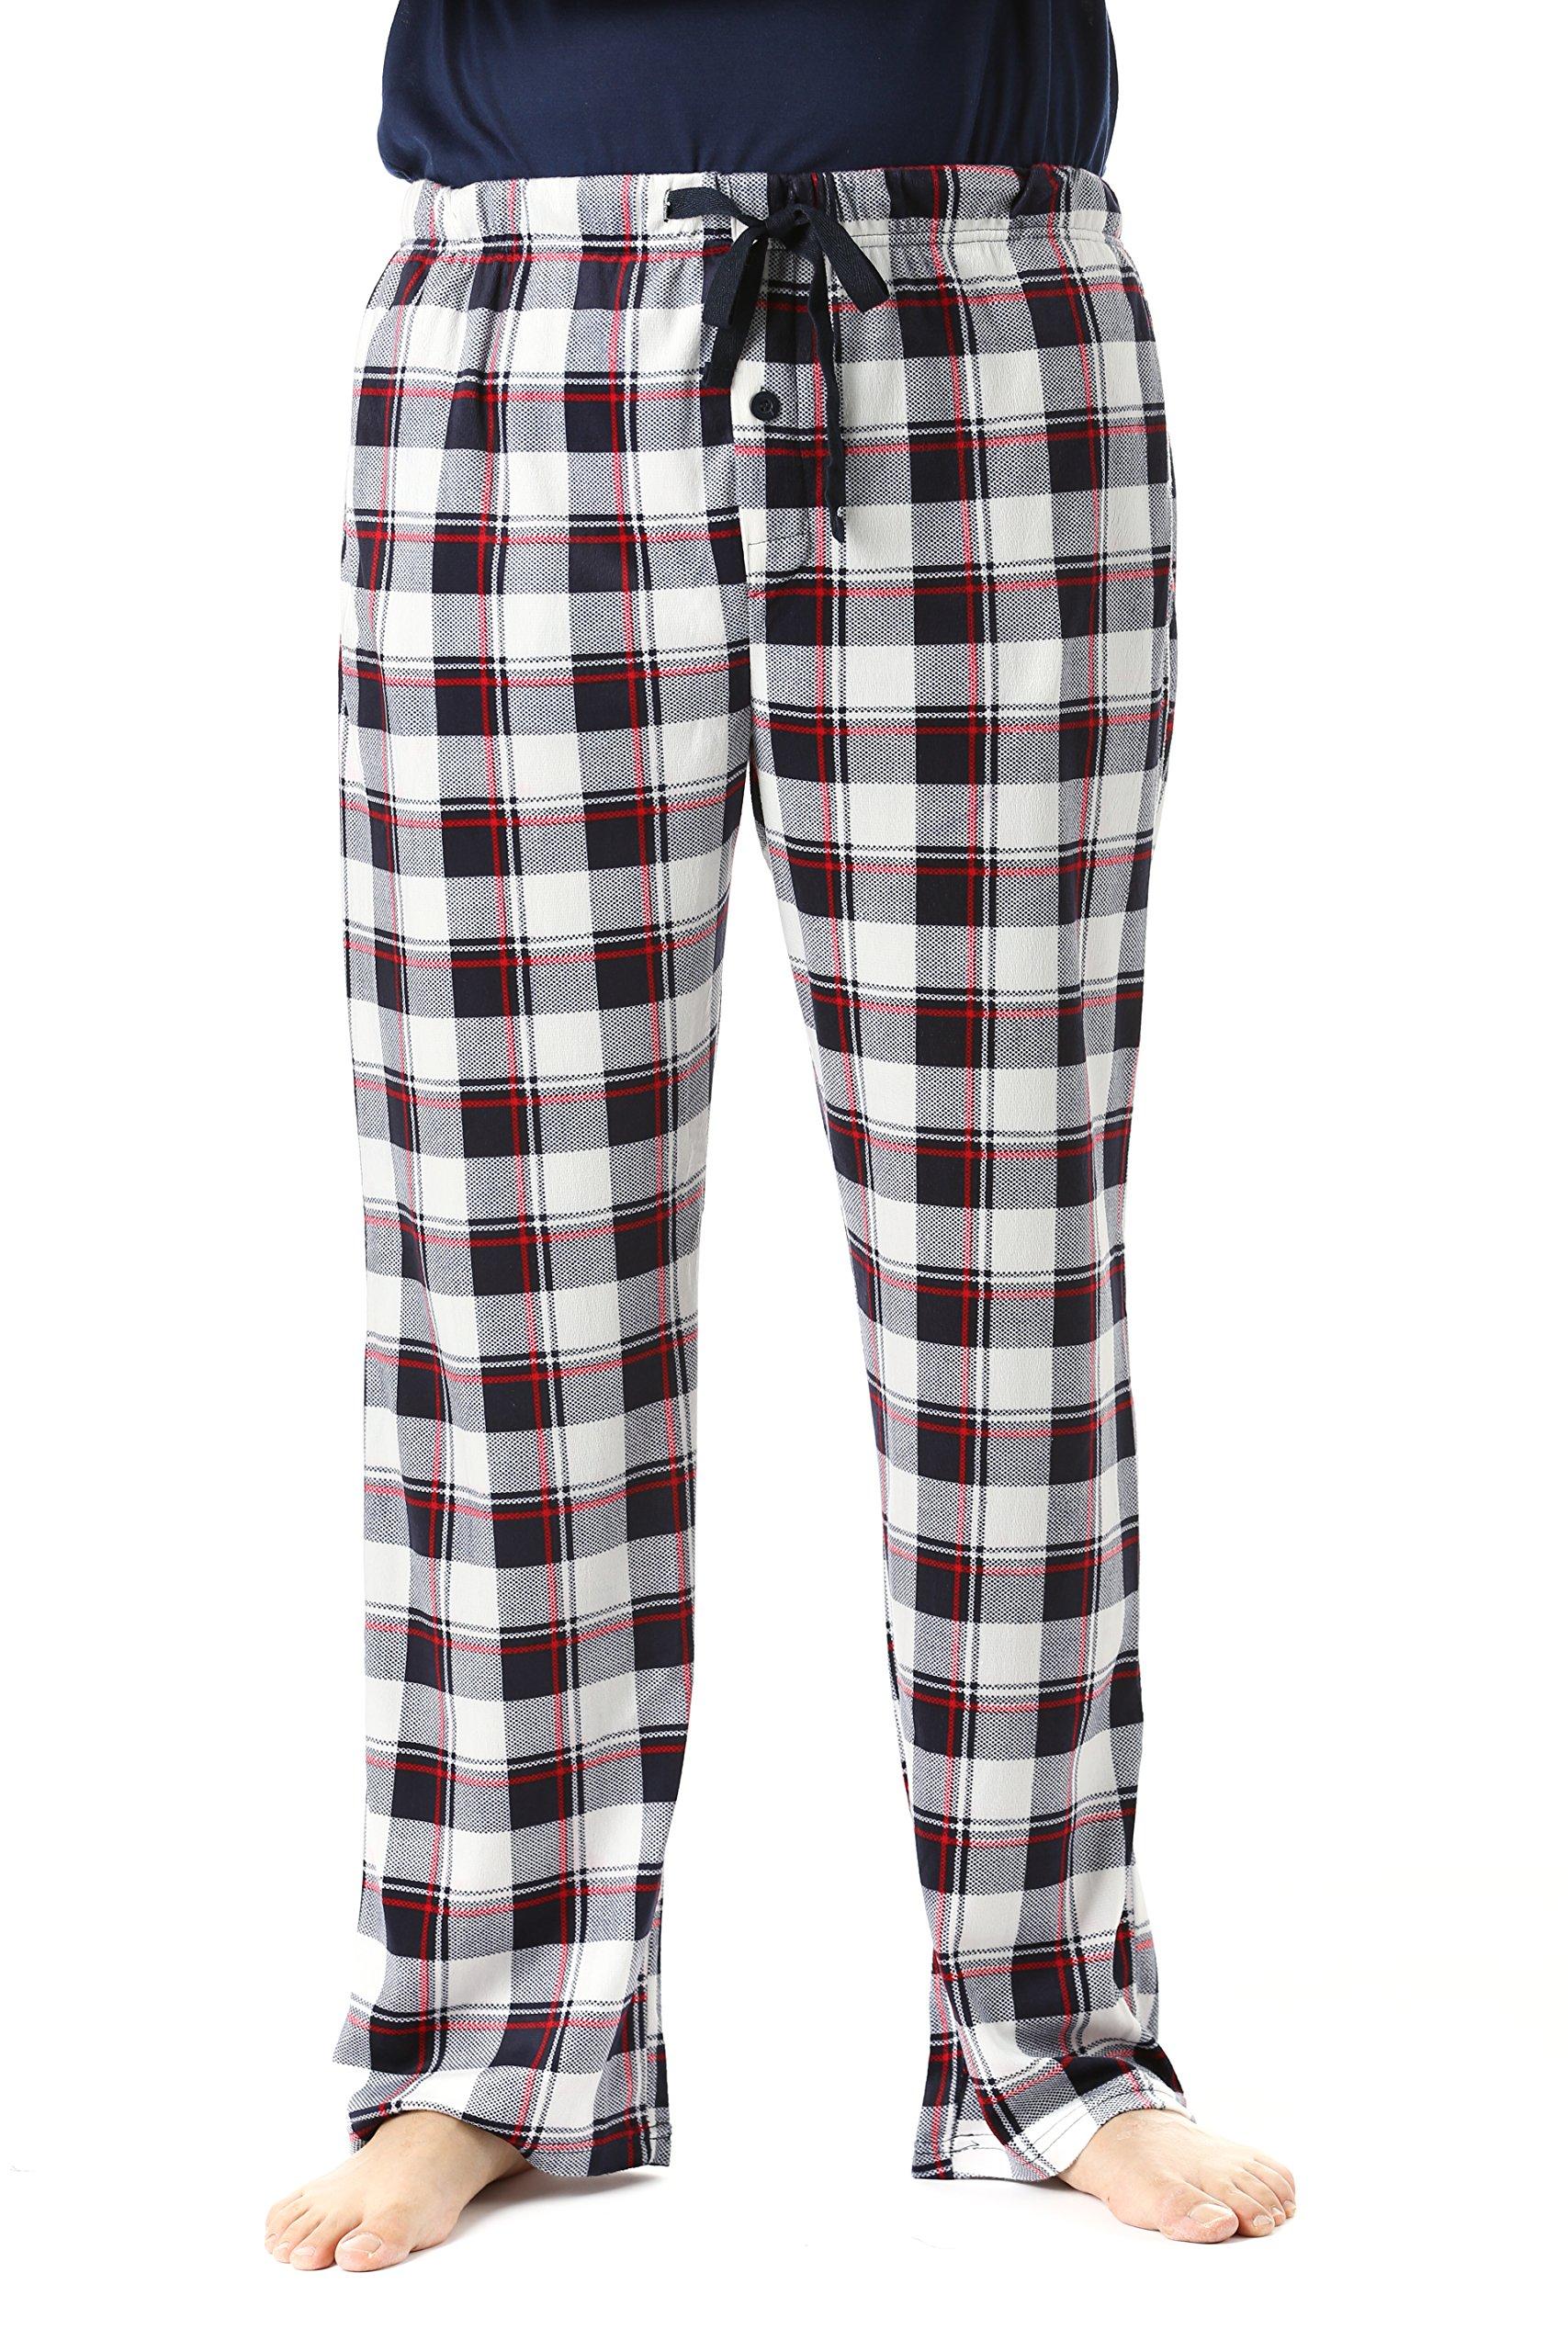 #FollowMe 45903-17-L Fleece Pajama Pants for Men/Sleepwear/PJs,Plaid 17,Large by #followme (Image #1)